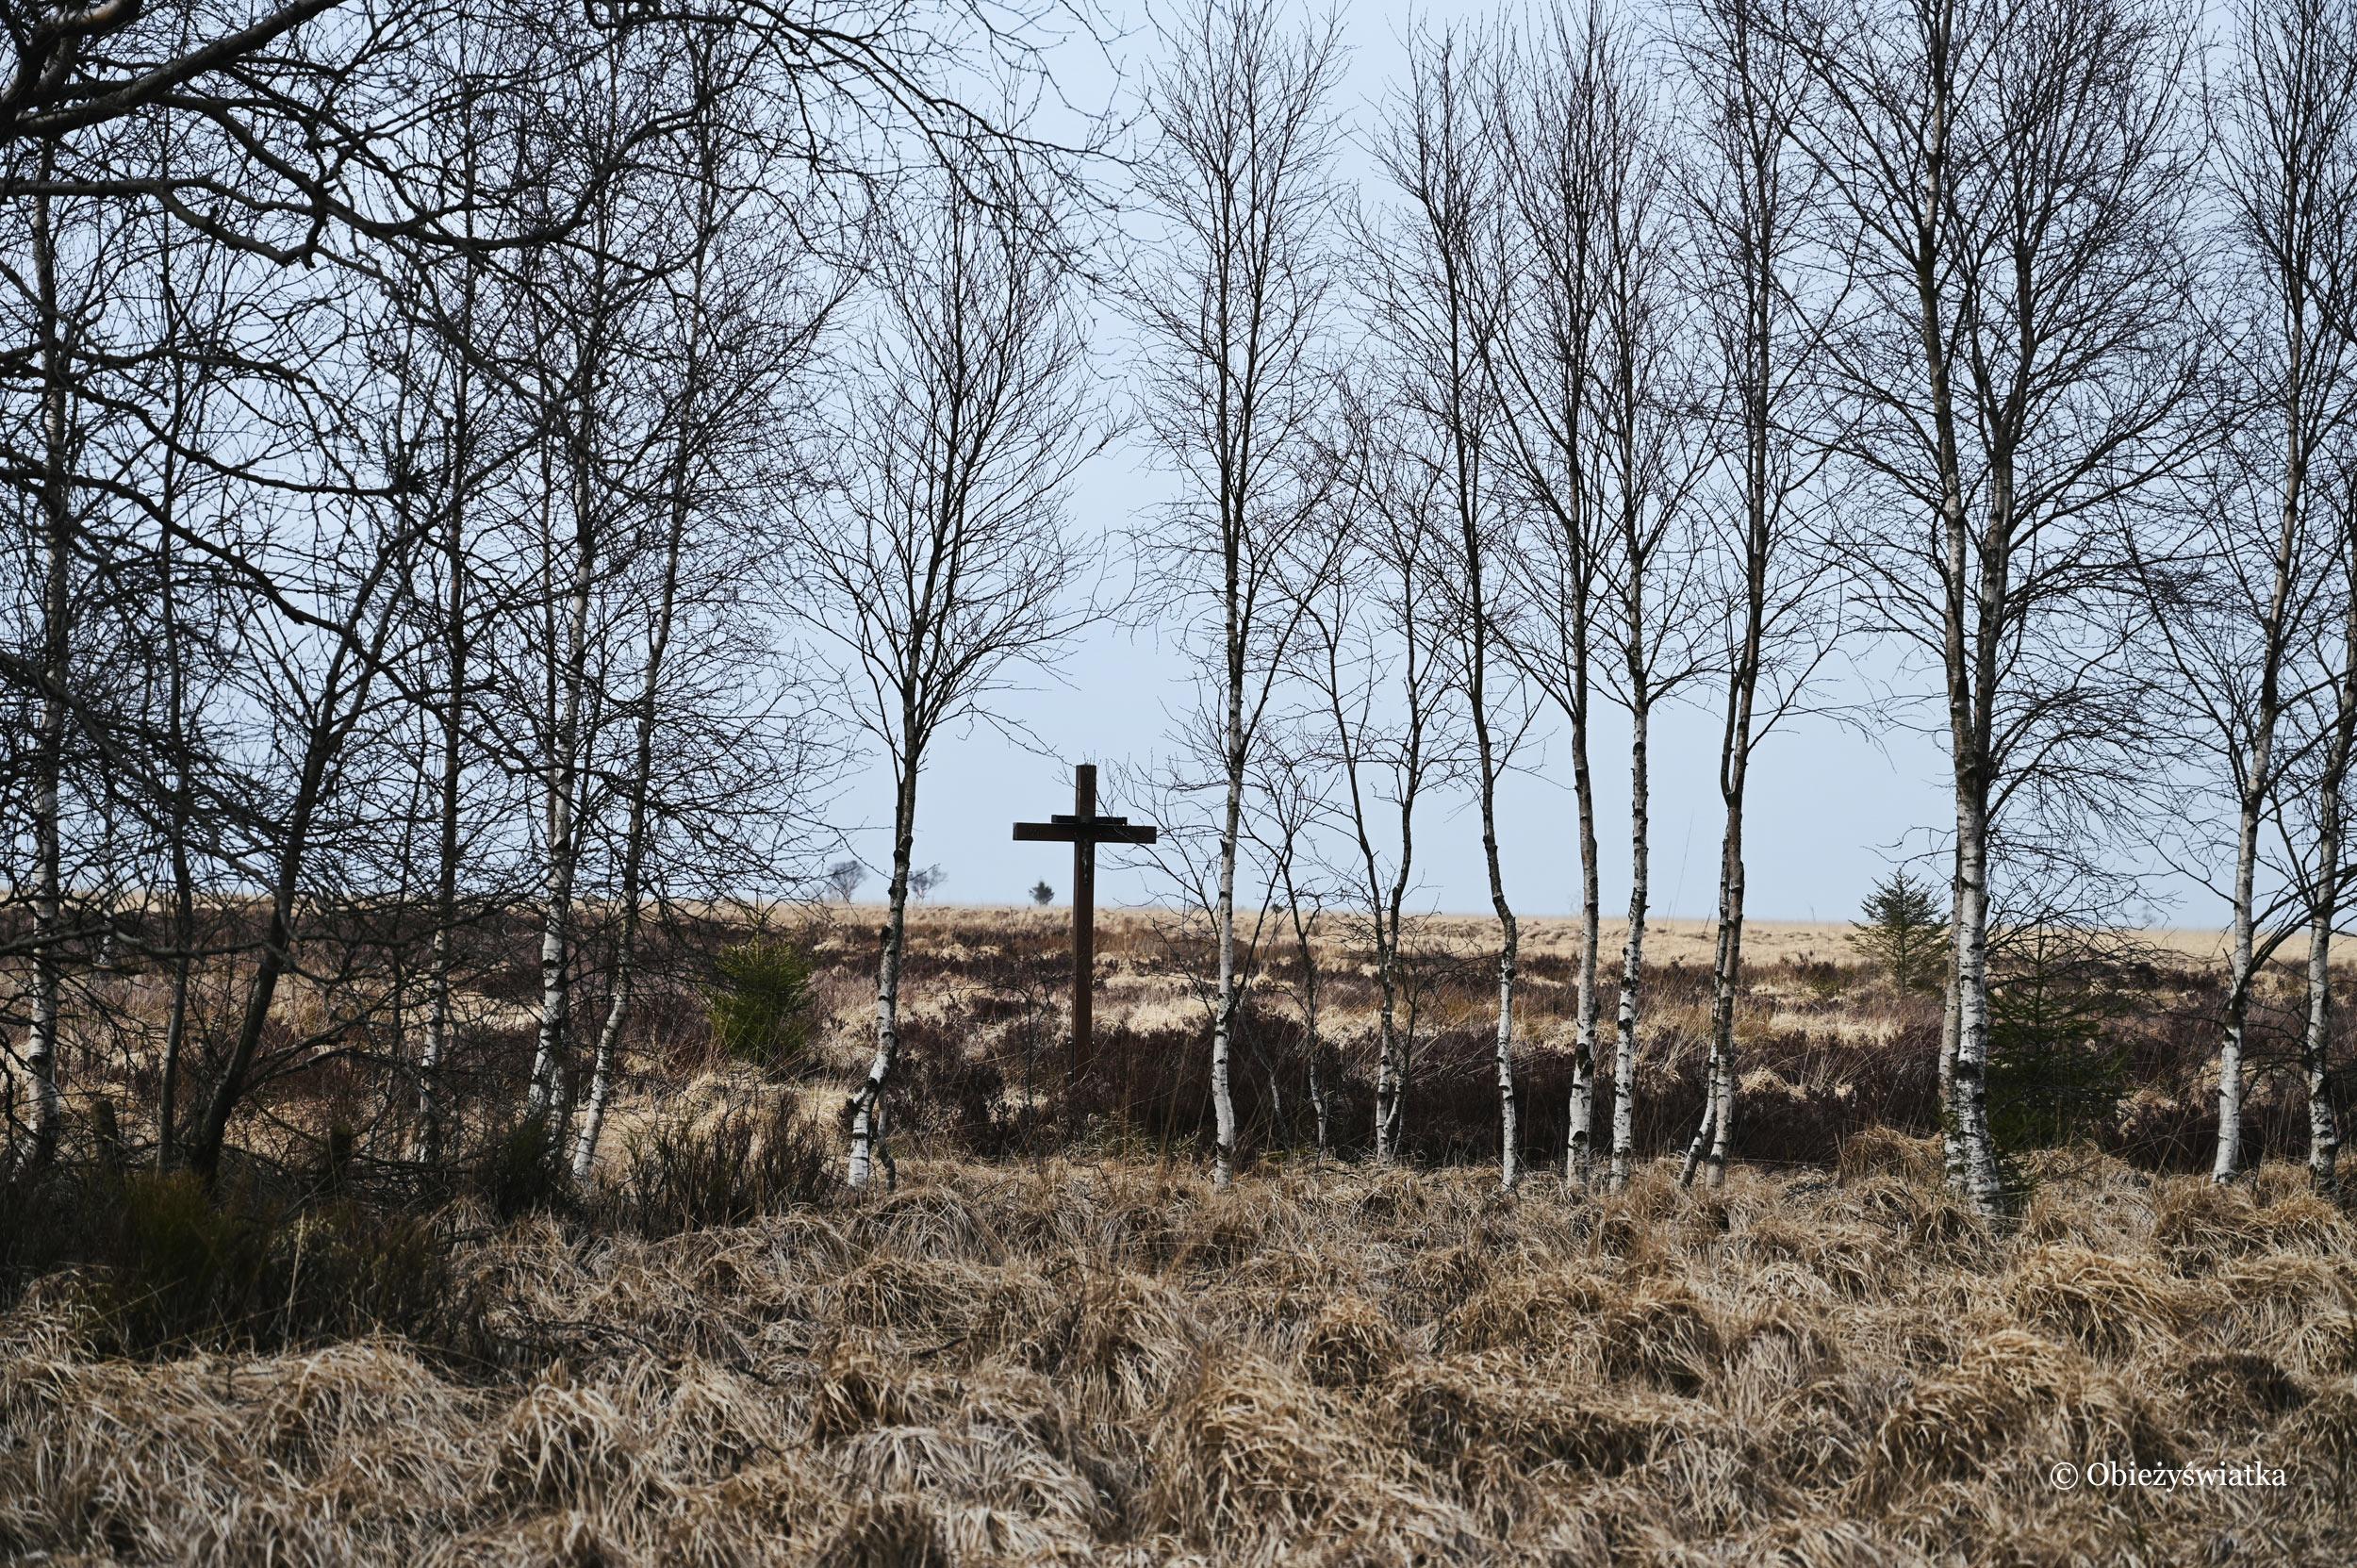 Krzyż na torfowiskach - Hohes Venn, Belgia